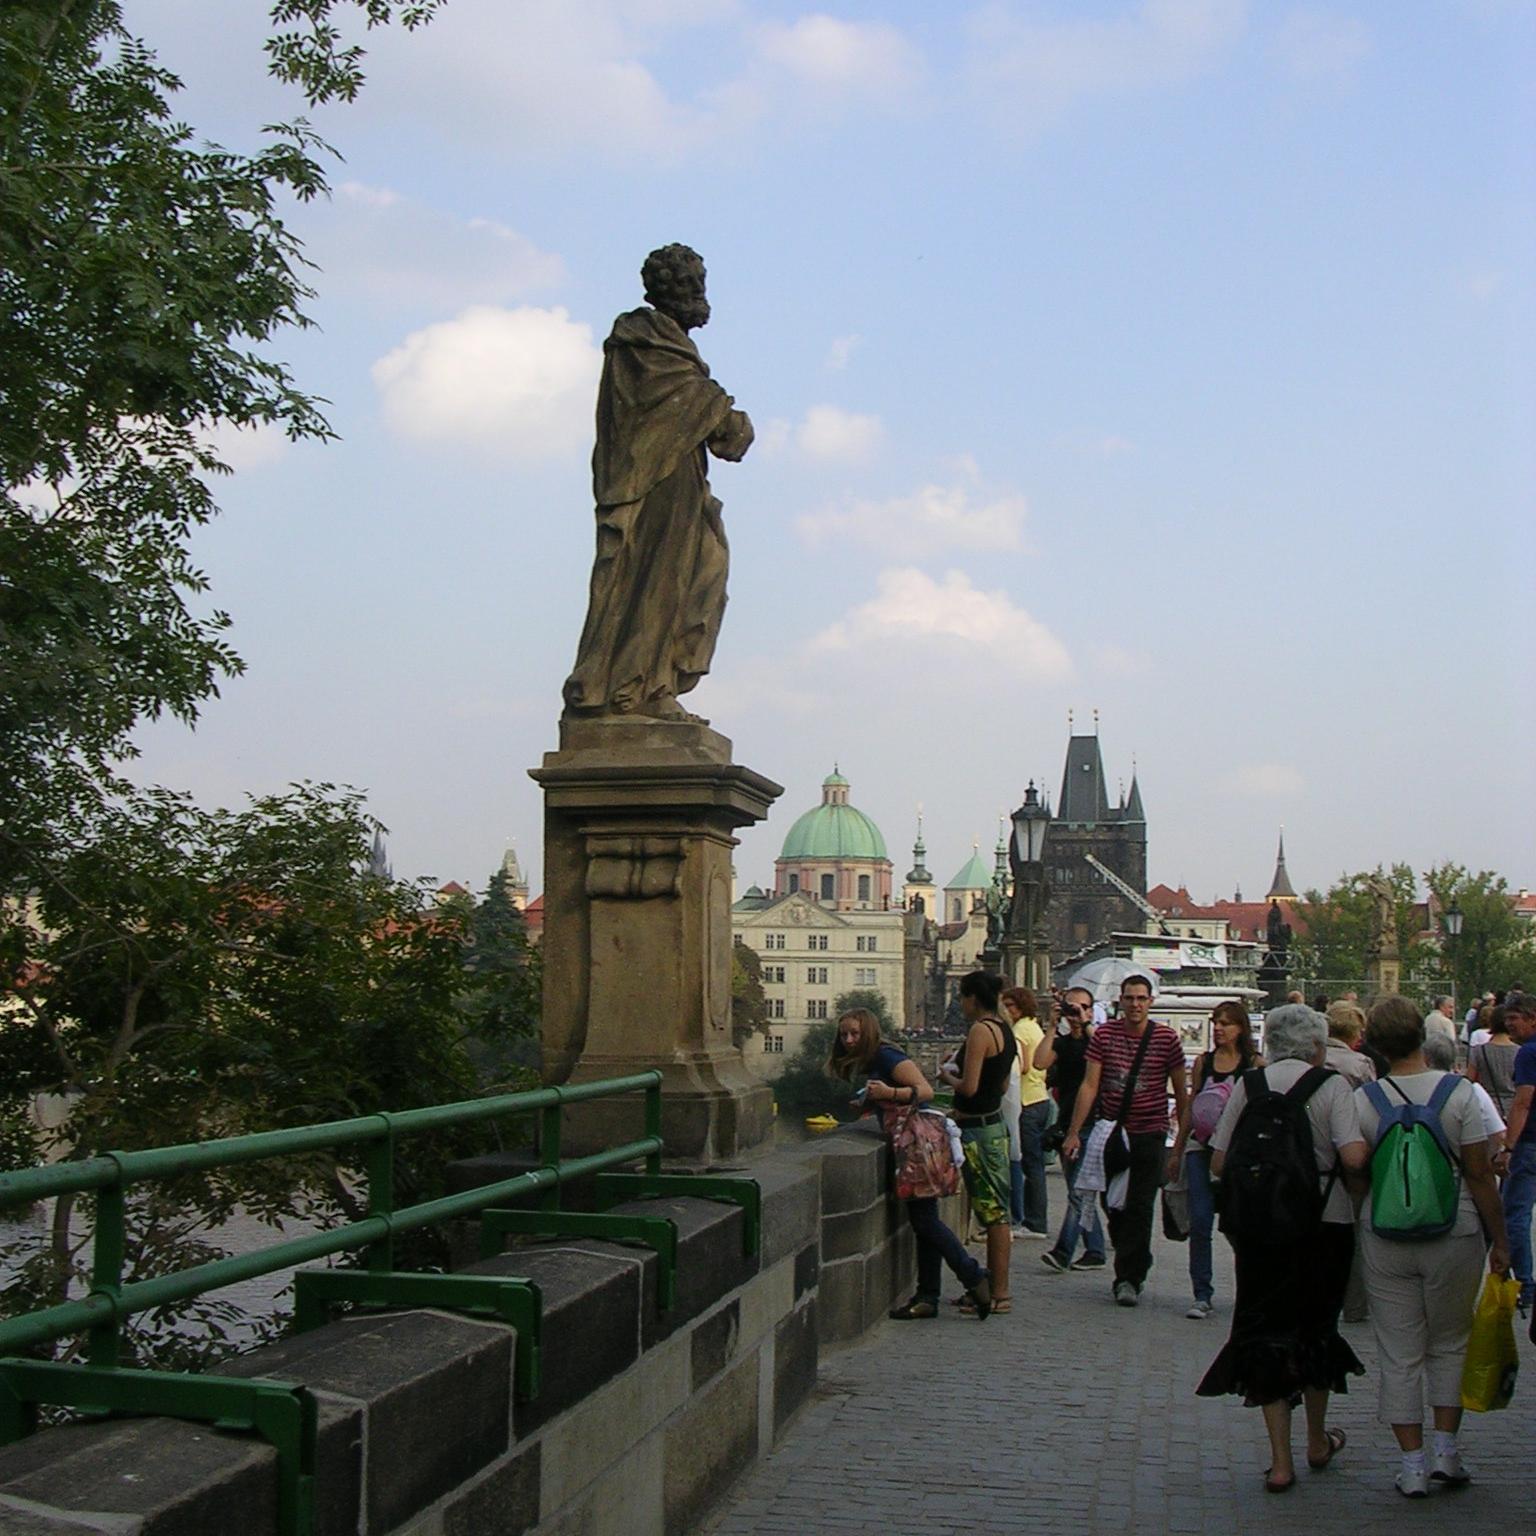 Charles Bridge, Prague by The Doubtful Traveller